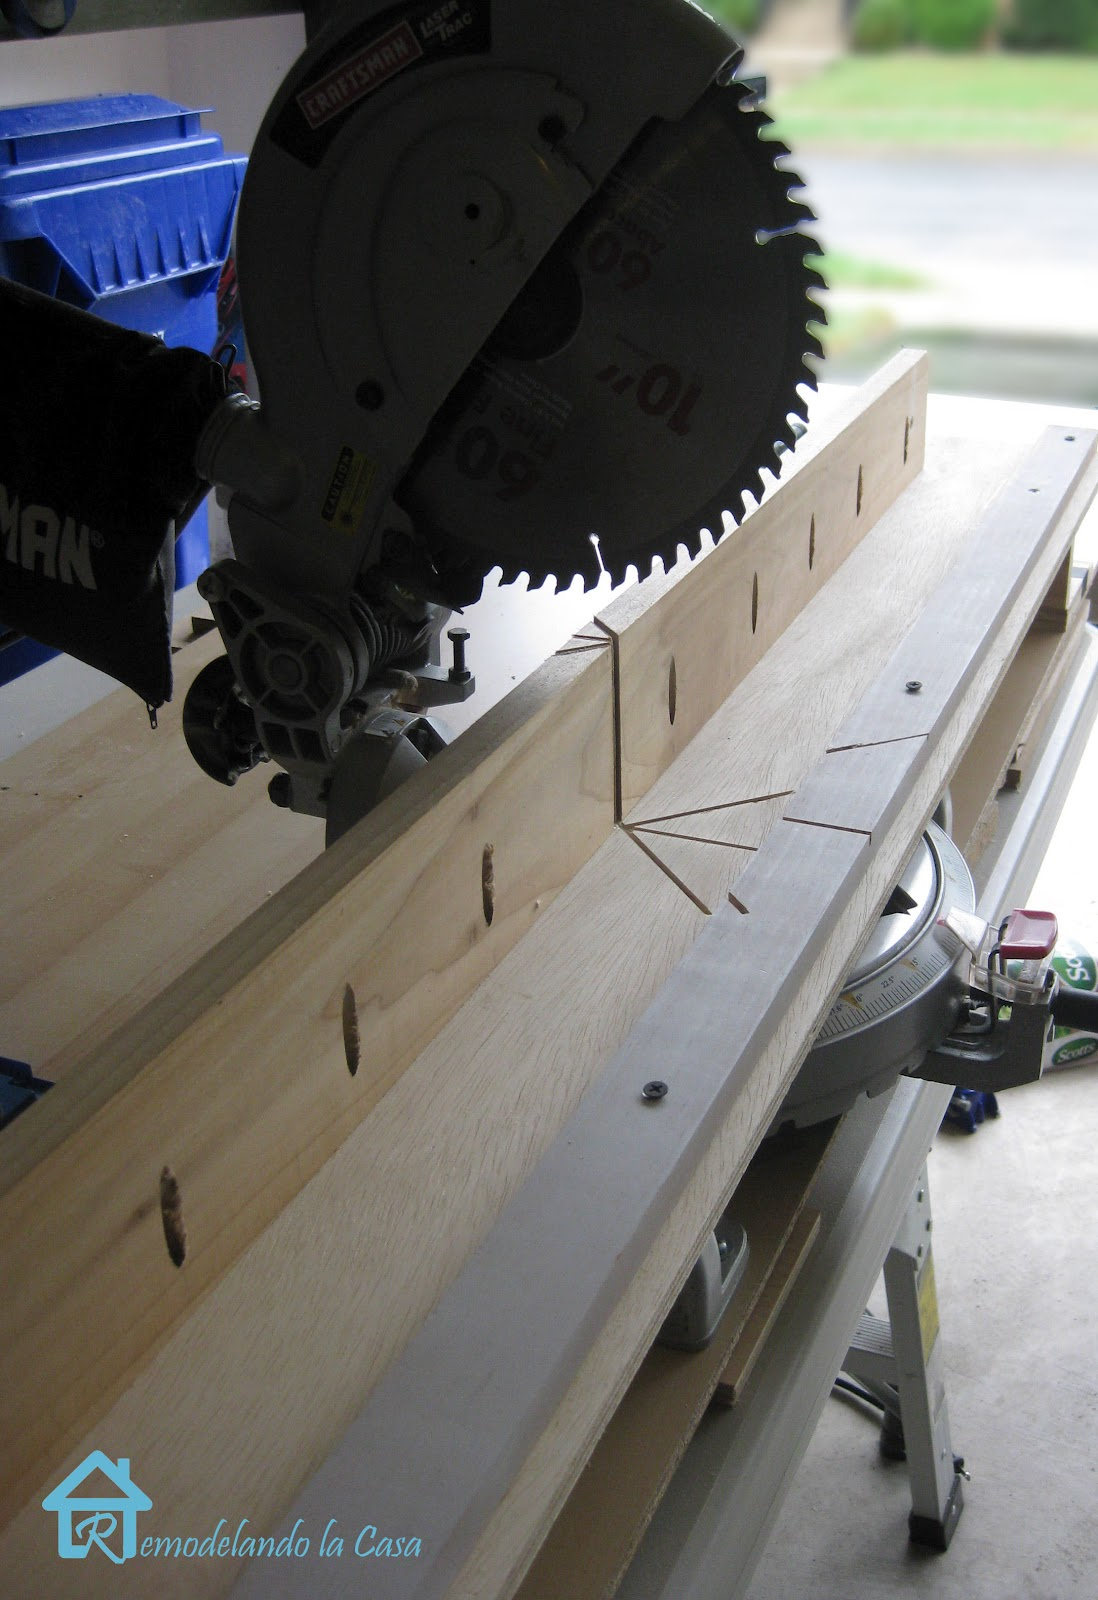 Cutting Crown Corners Anyone? - Remodelando la Casa